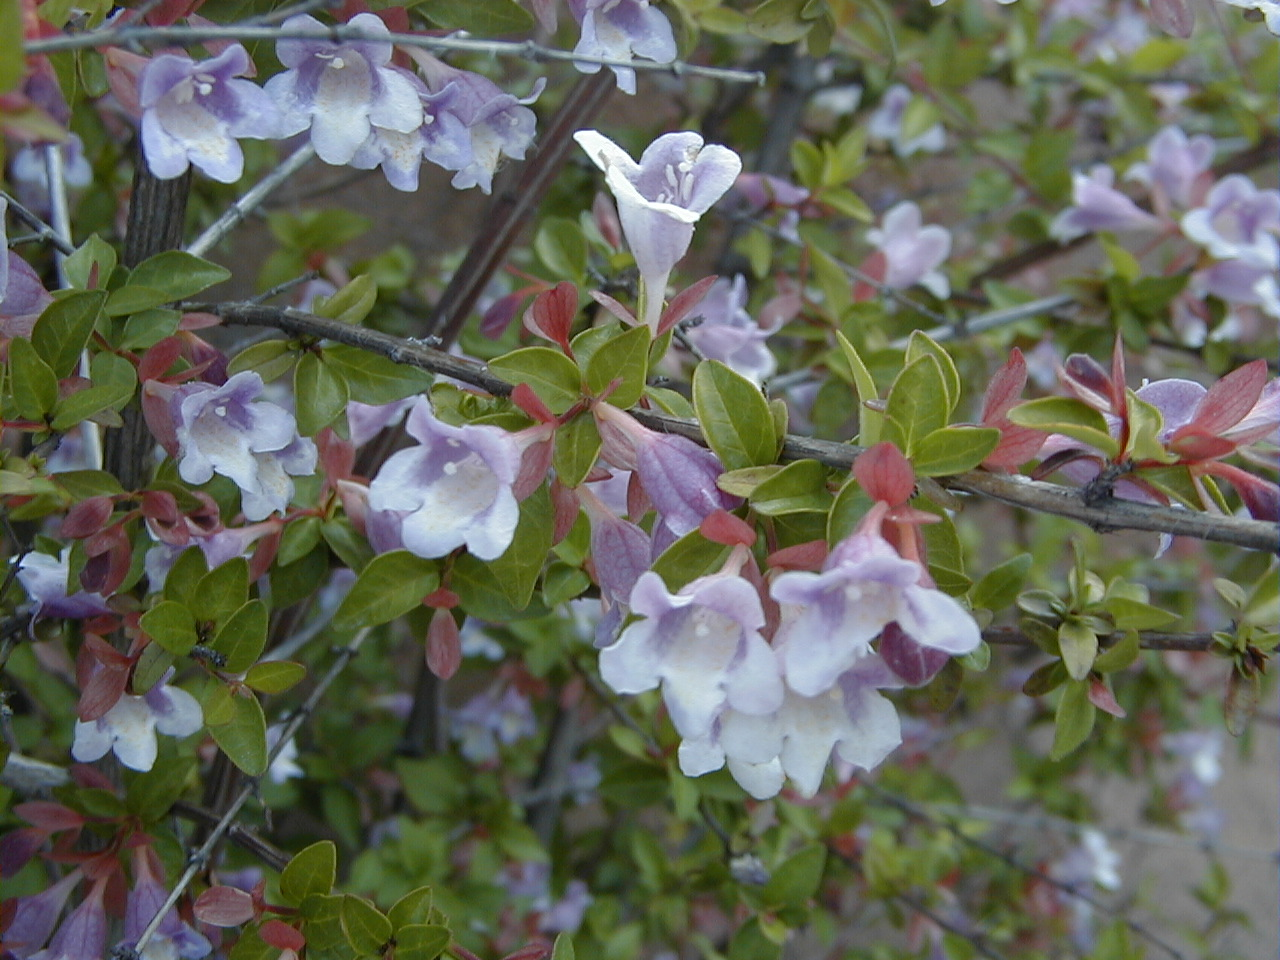 Arbuste Fleuri Feuillage Persistant l'abélia, un arbuste fleuri et au feuillage décoratif